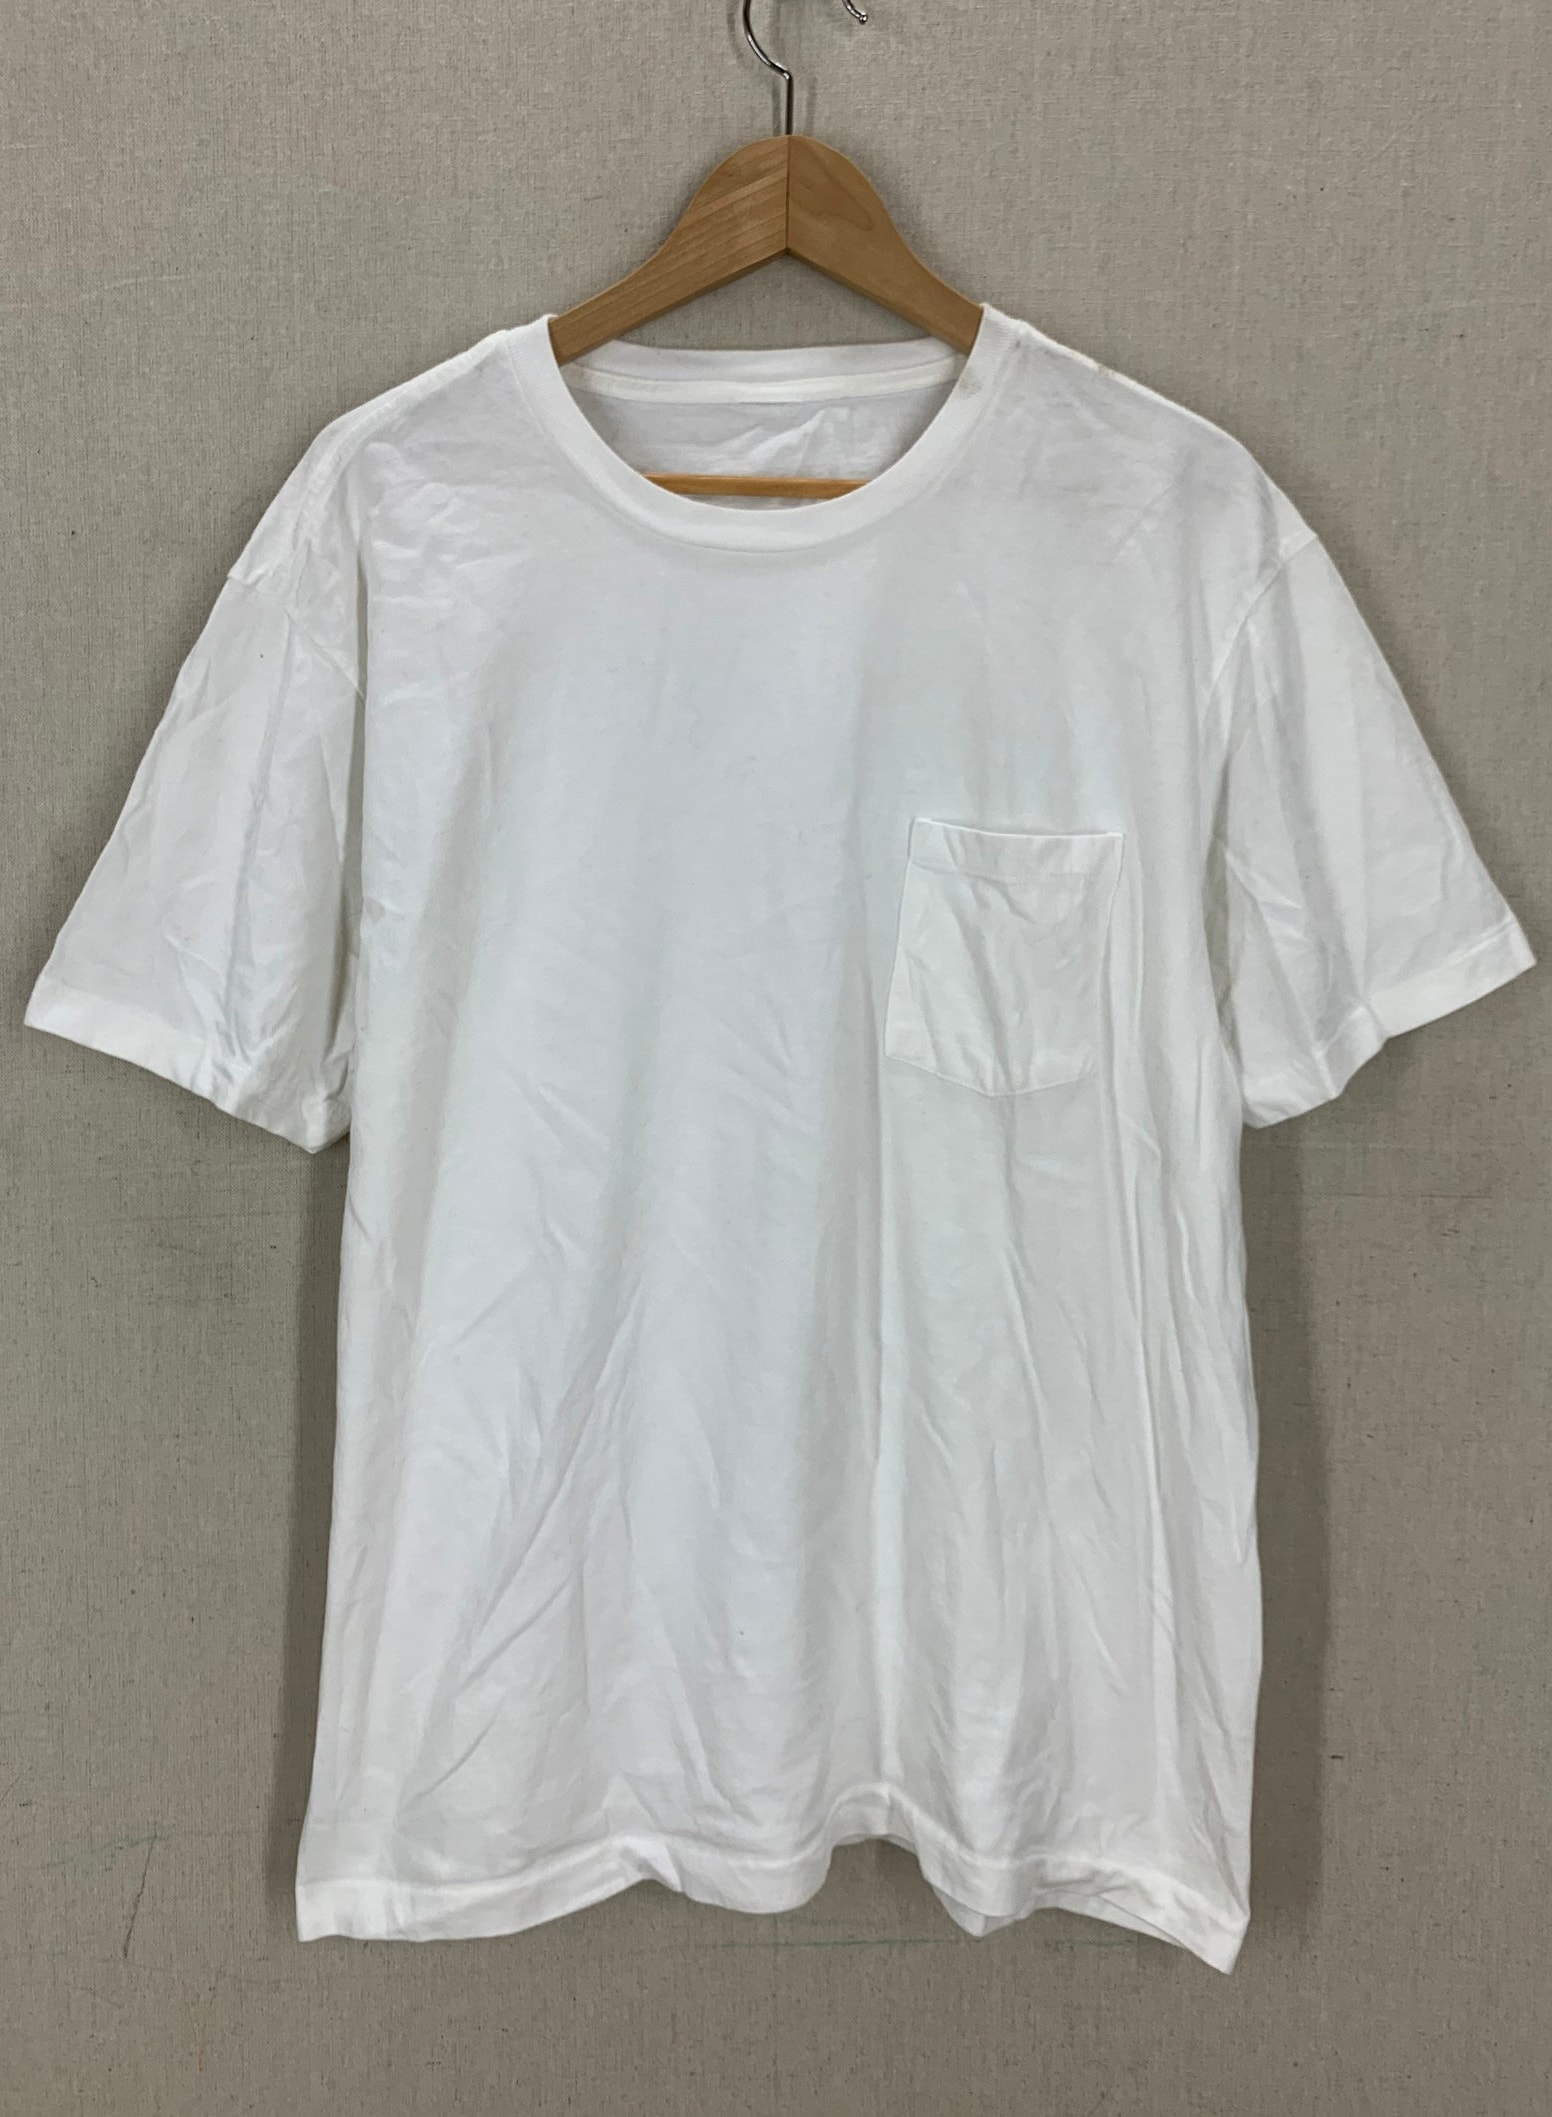 Vintage 90's Blank White Single Stitch Pocket T-Shirt XL